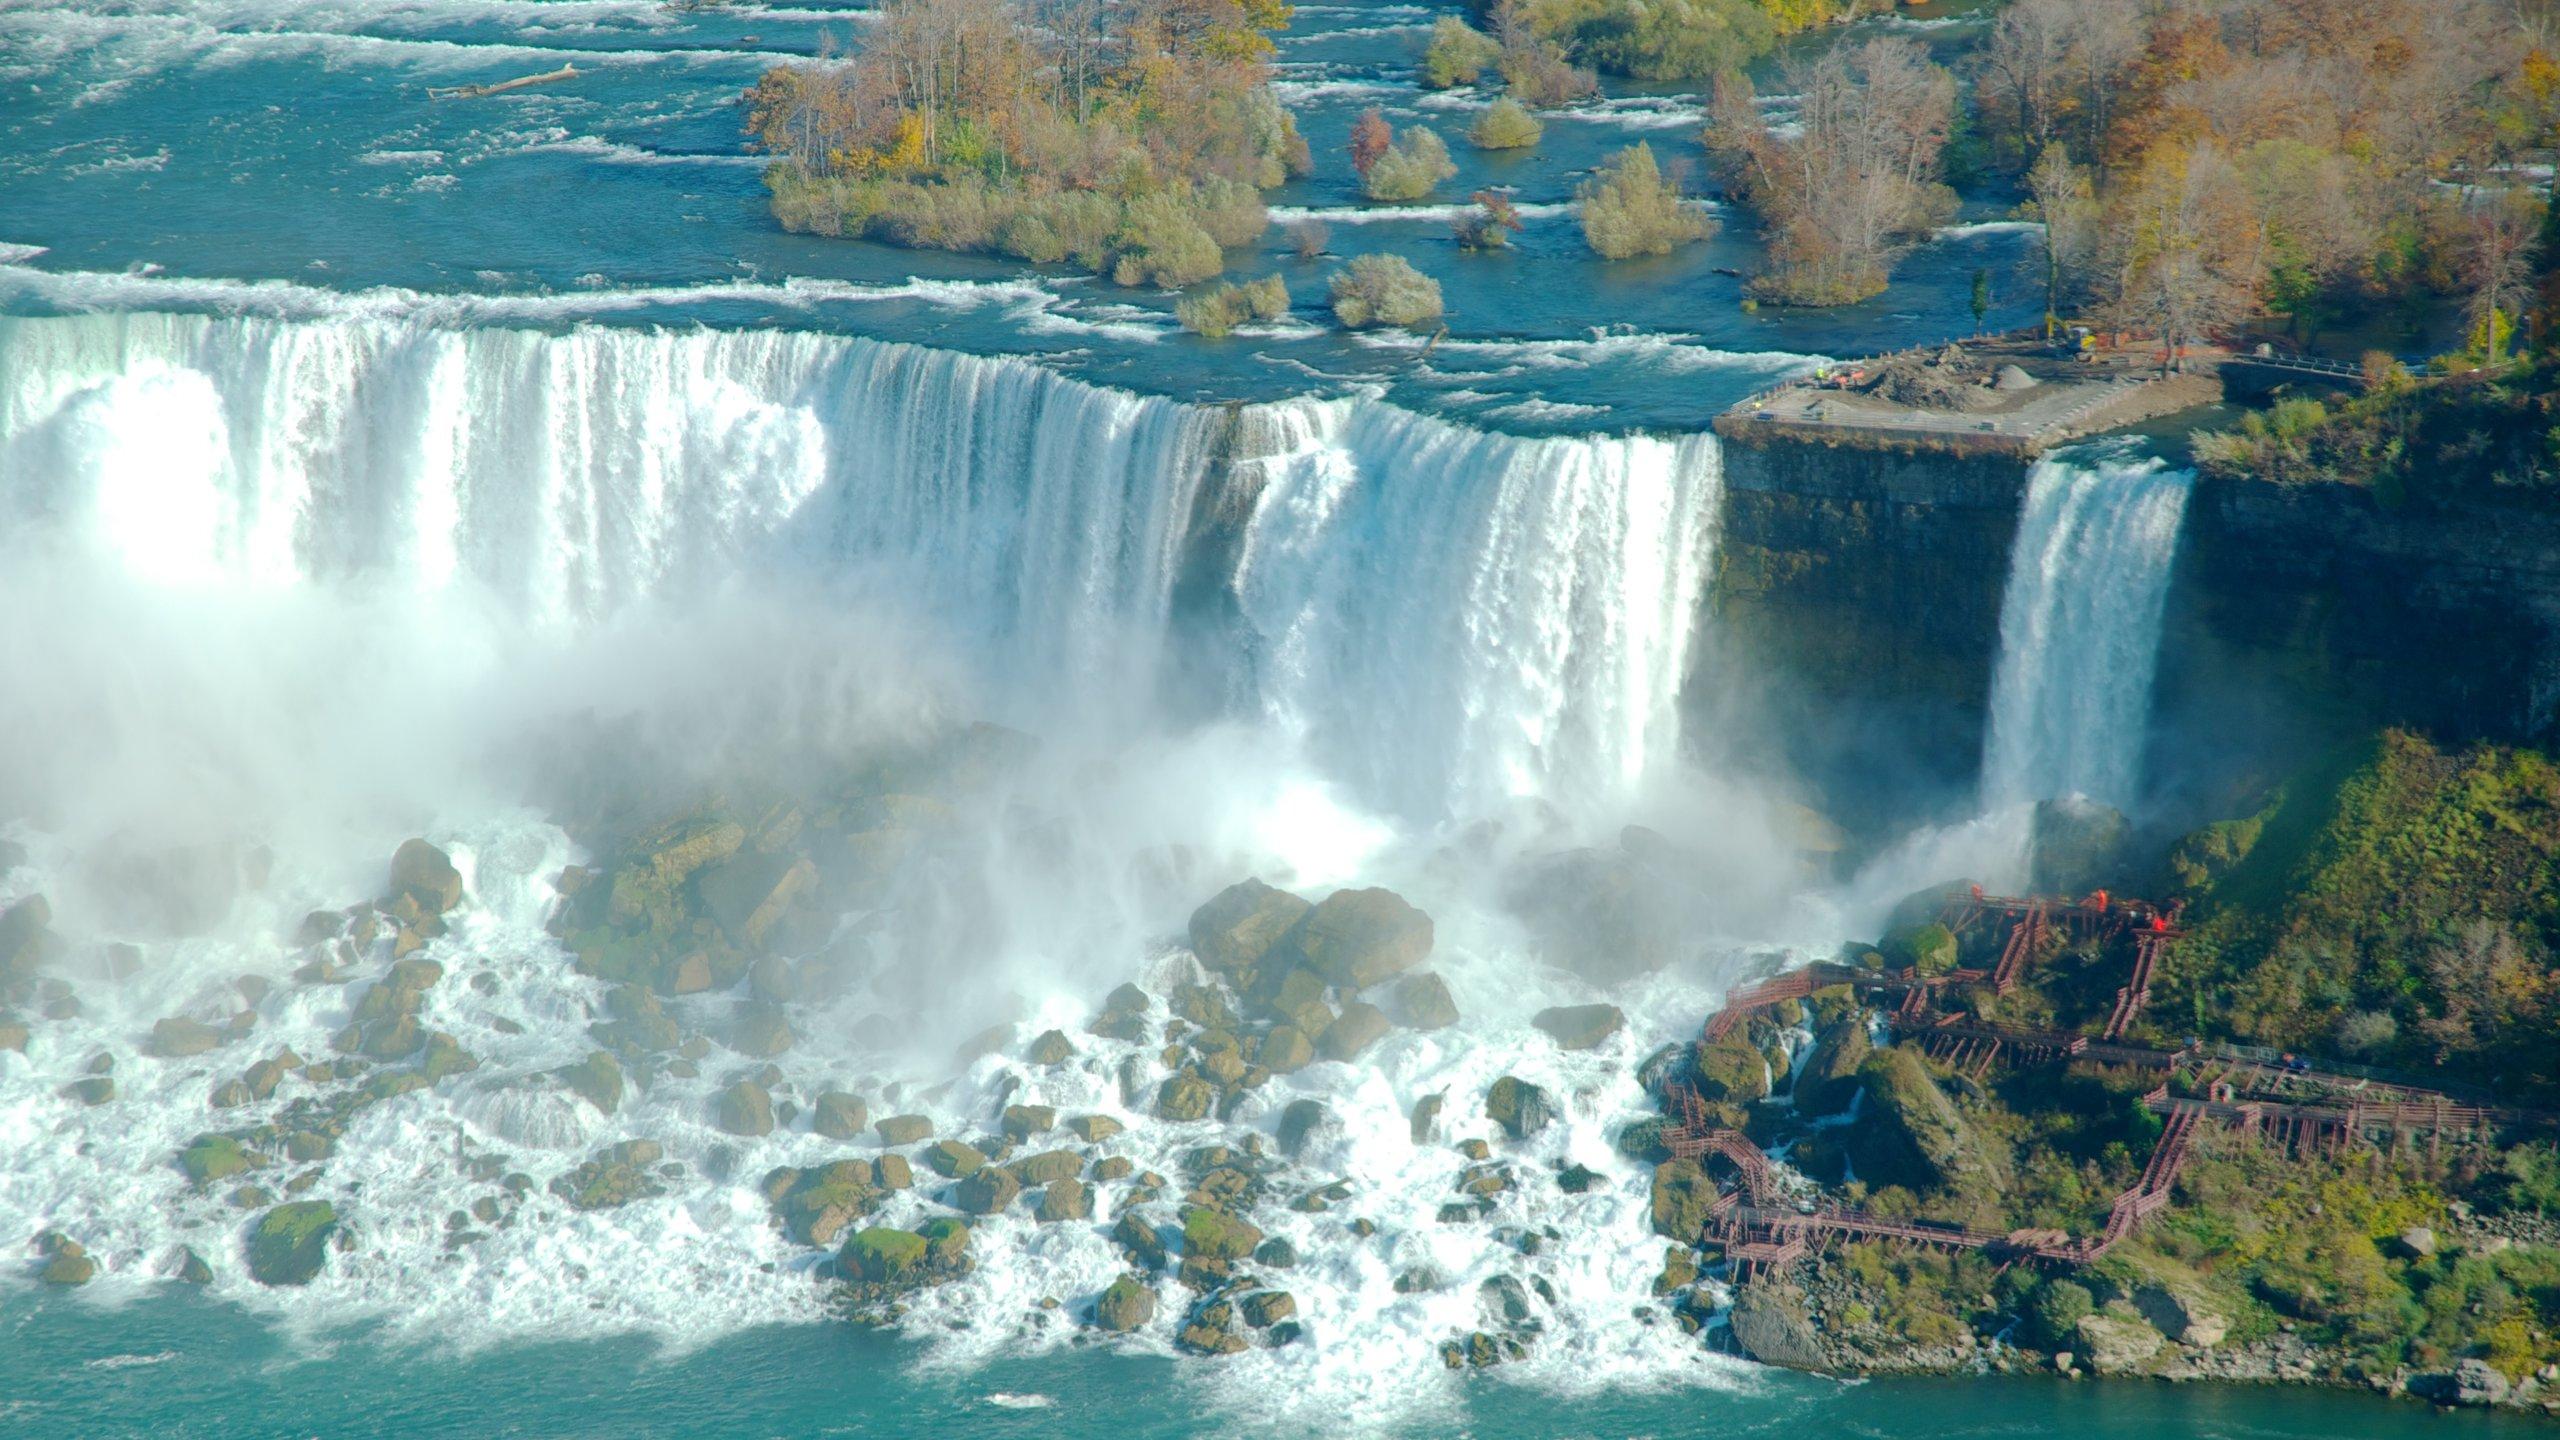 Cheap Hotels In Niagara Falls Find 52 Hotel Deals Travelocity